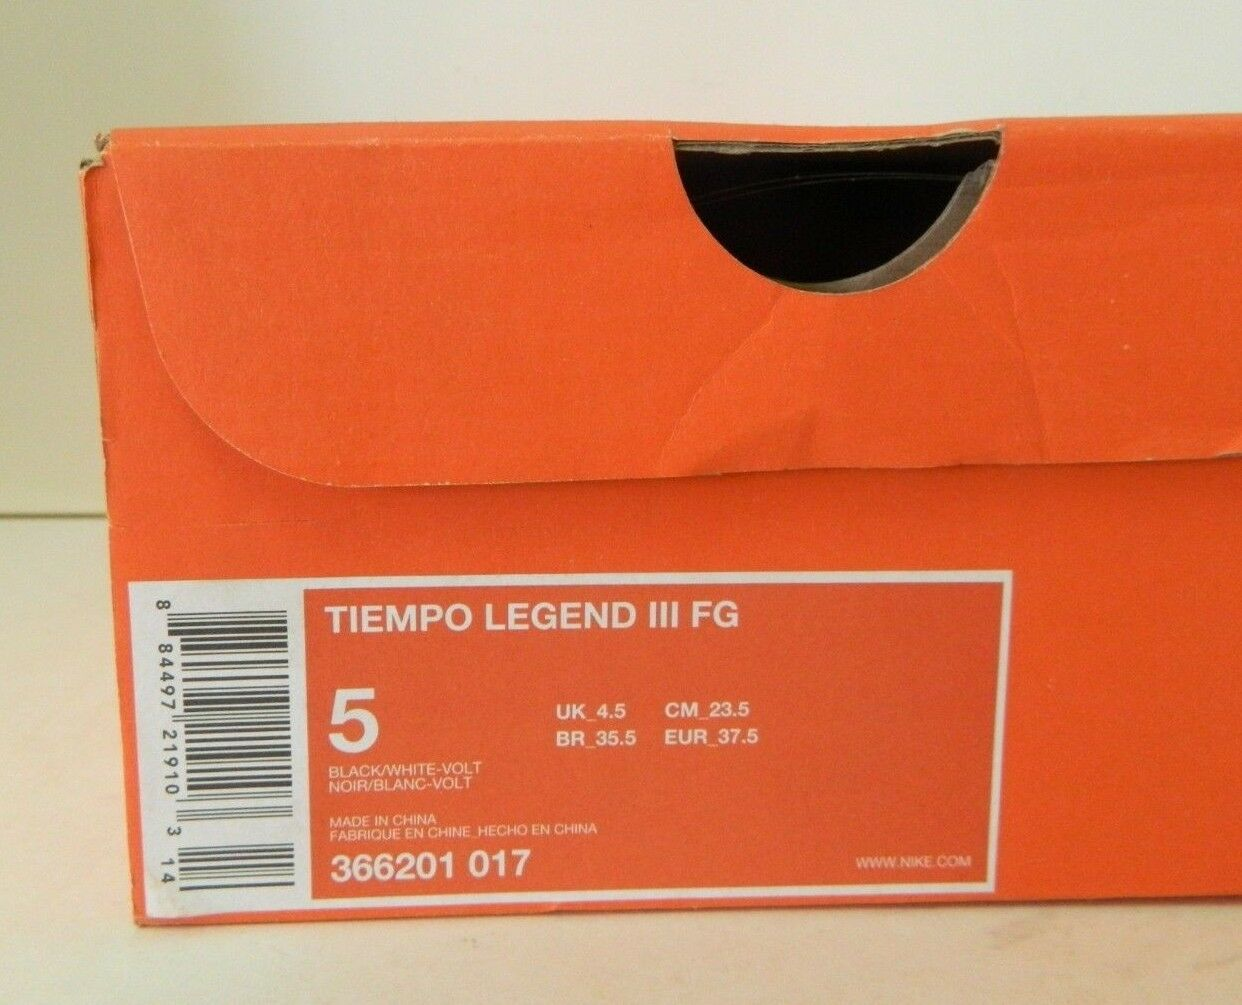 1459069bd8a ... NEW Tiempo Legend III FG Soccer Cleats Men s Size Size Size 5 Black  White Green b3649f